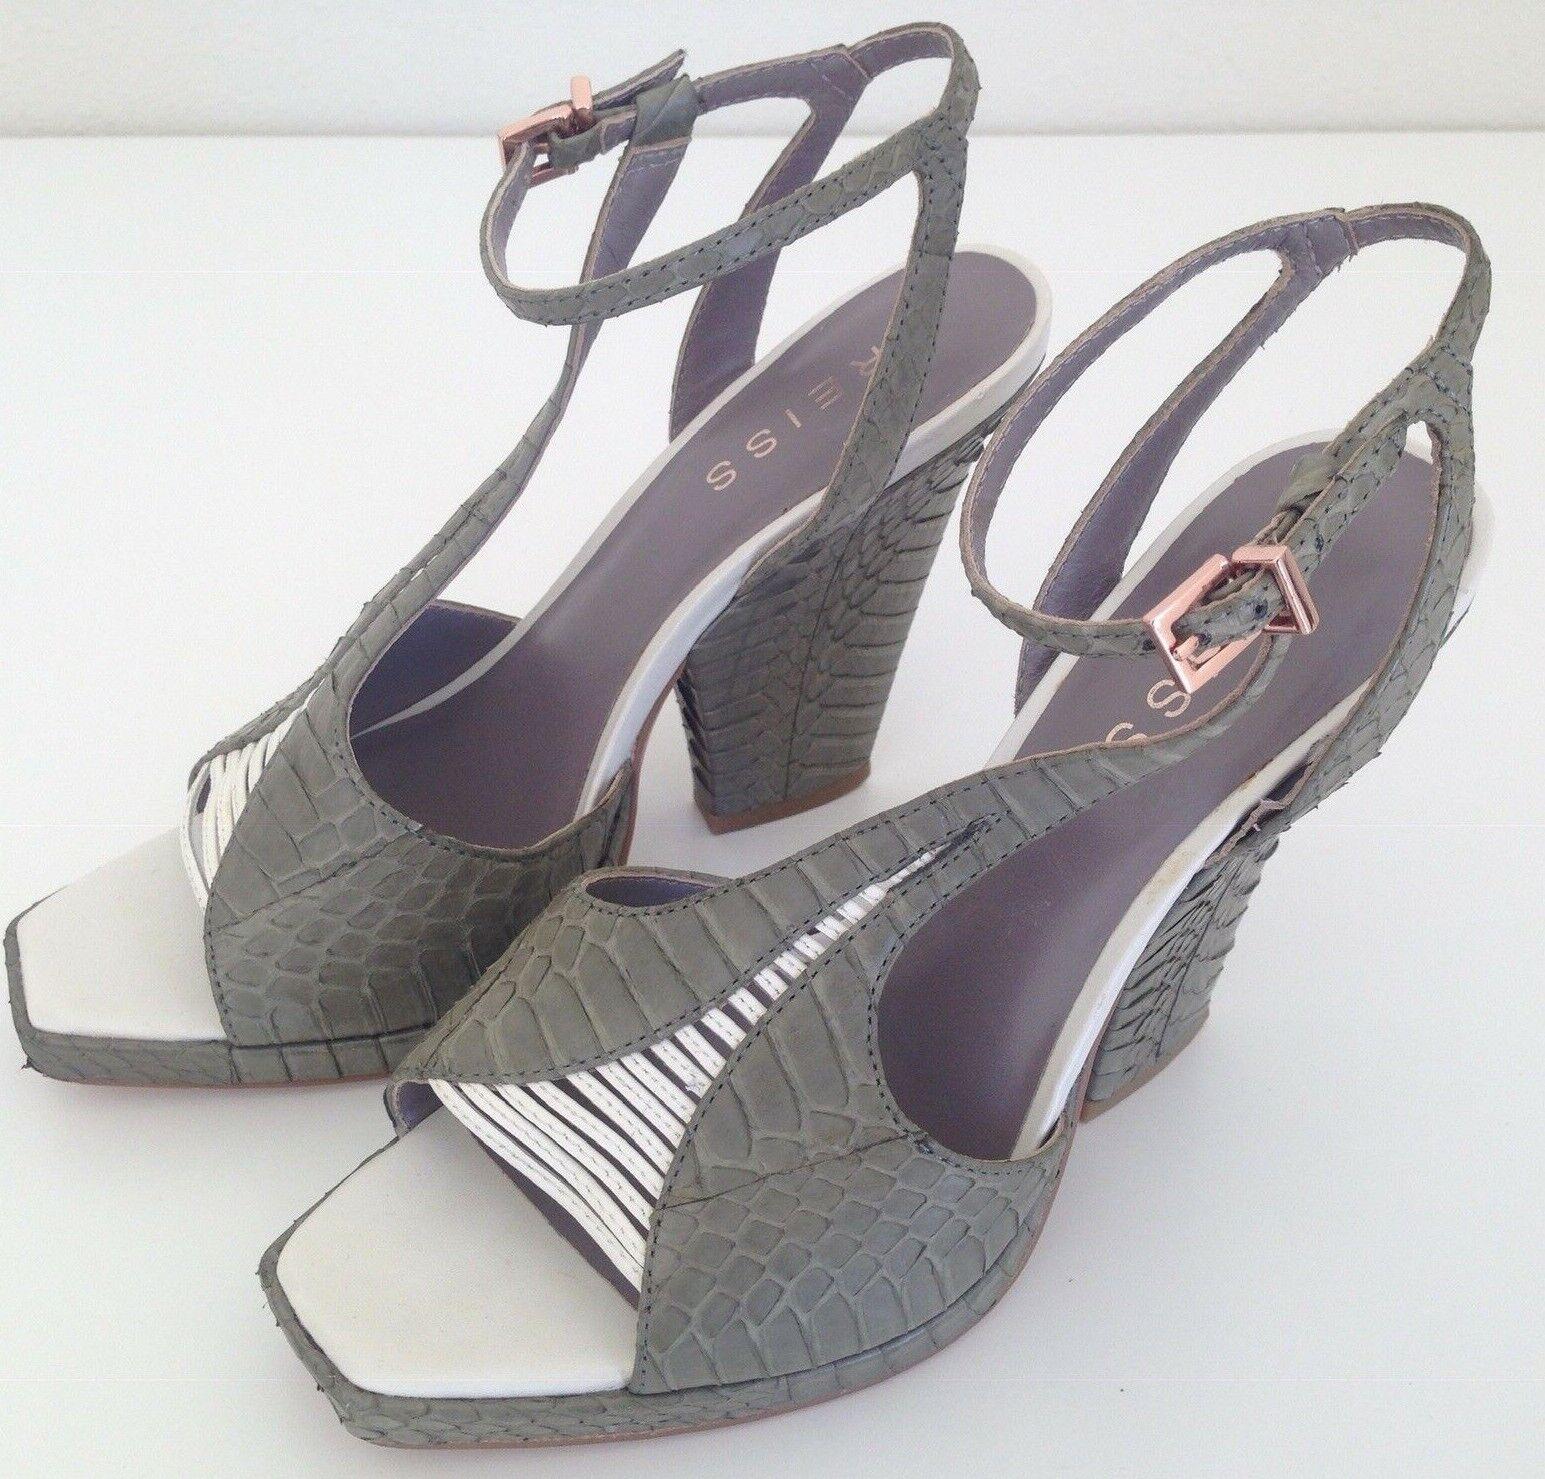 Reiss Pumps Wedge donna US7 EU37 verde bianca Snake Leather scarpe